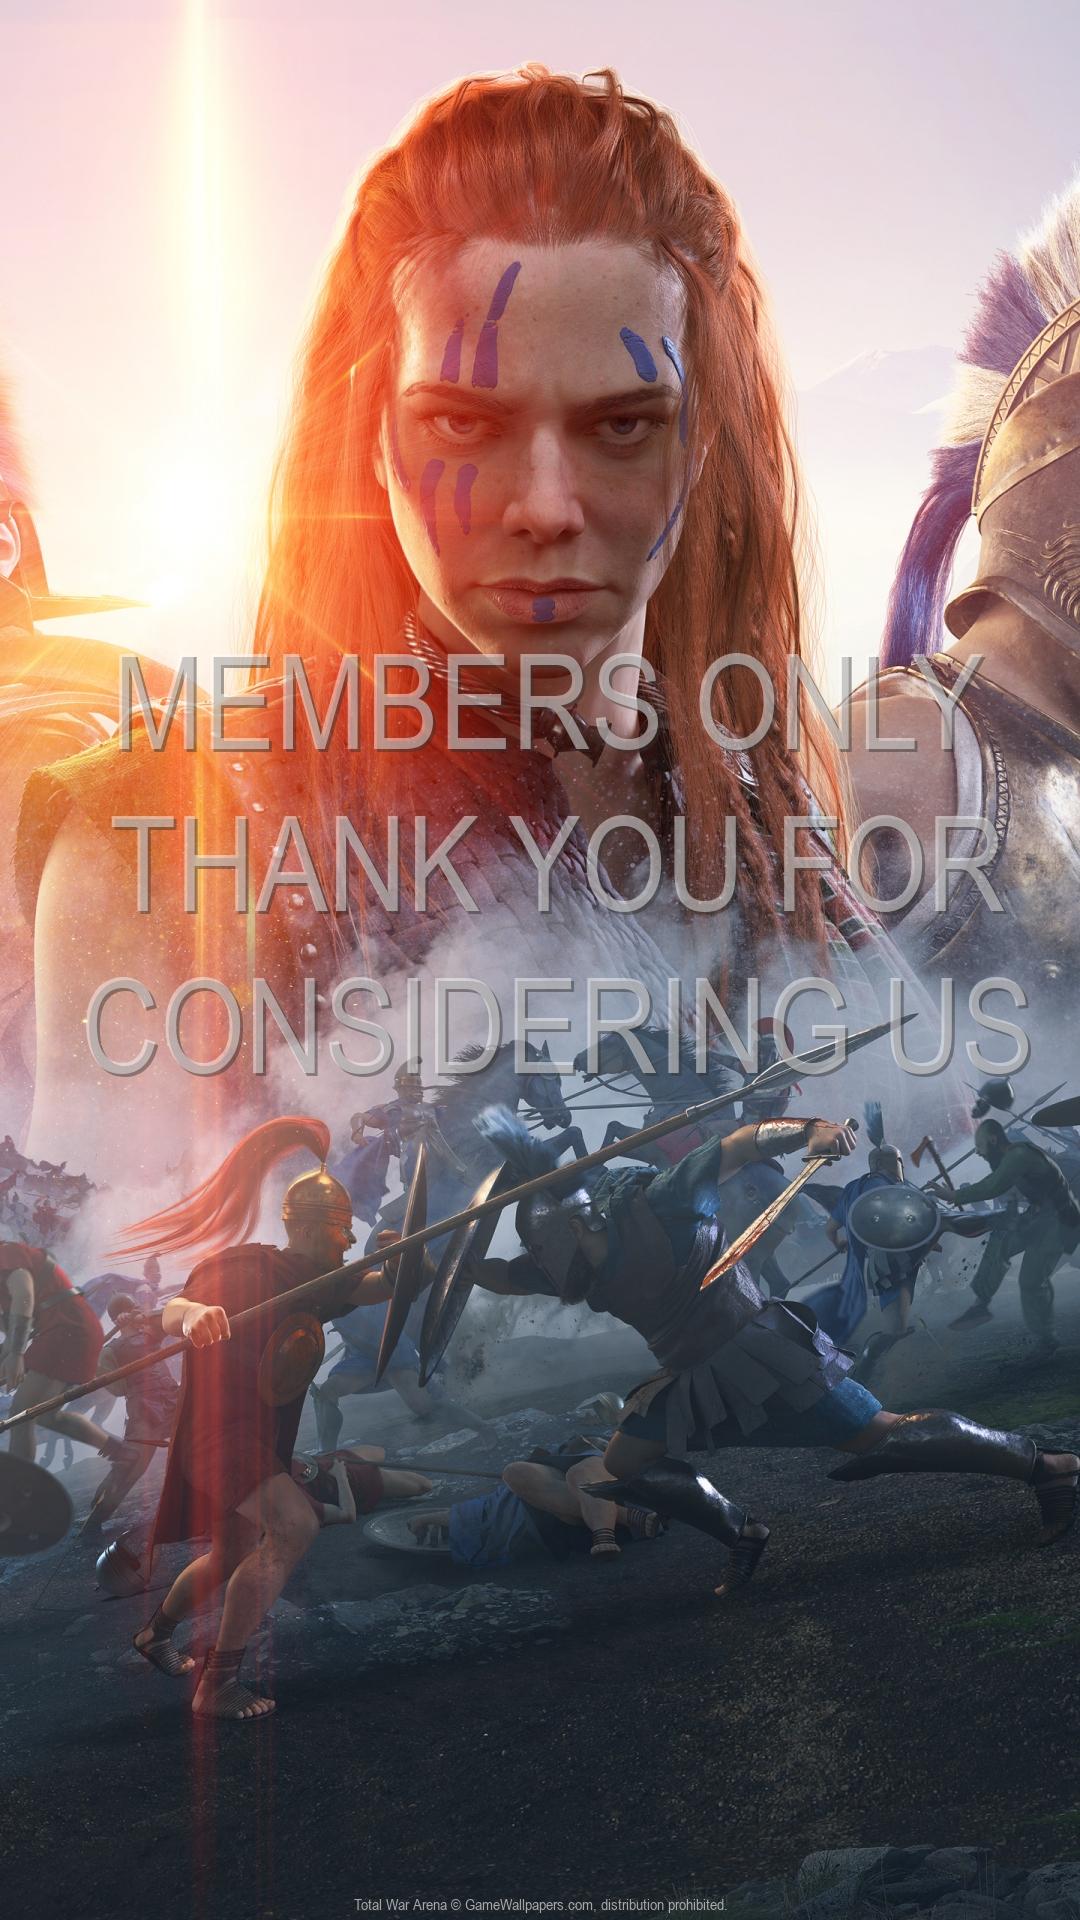 Total War: Arena 1920x1080 Mobile fond d'écran 02